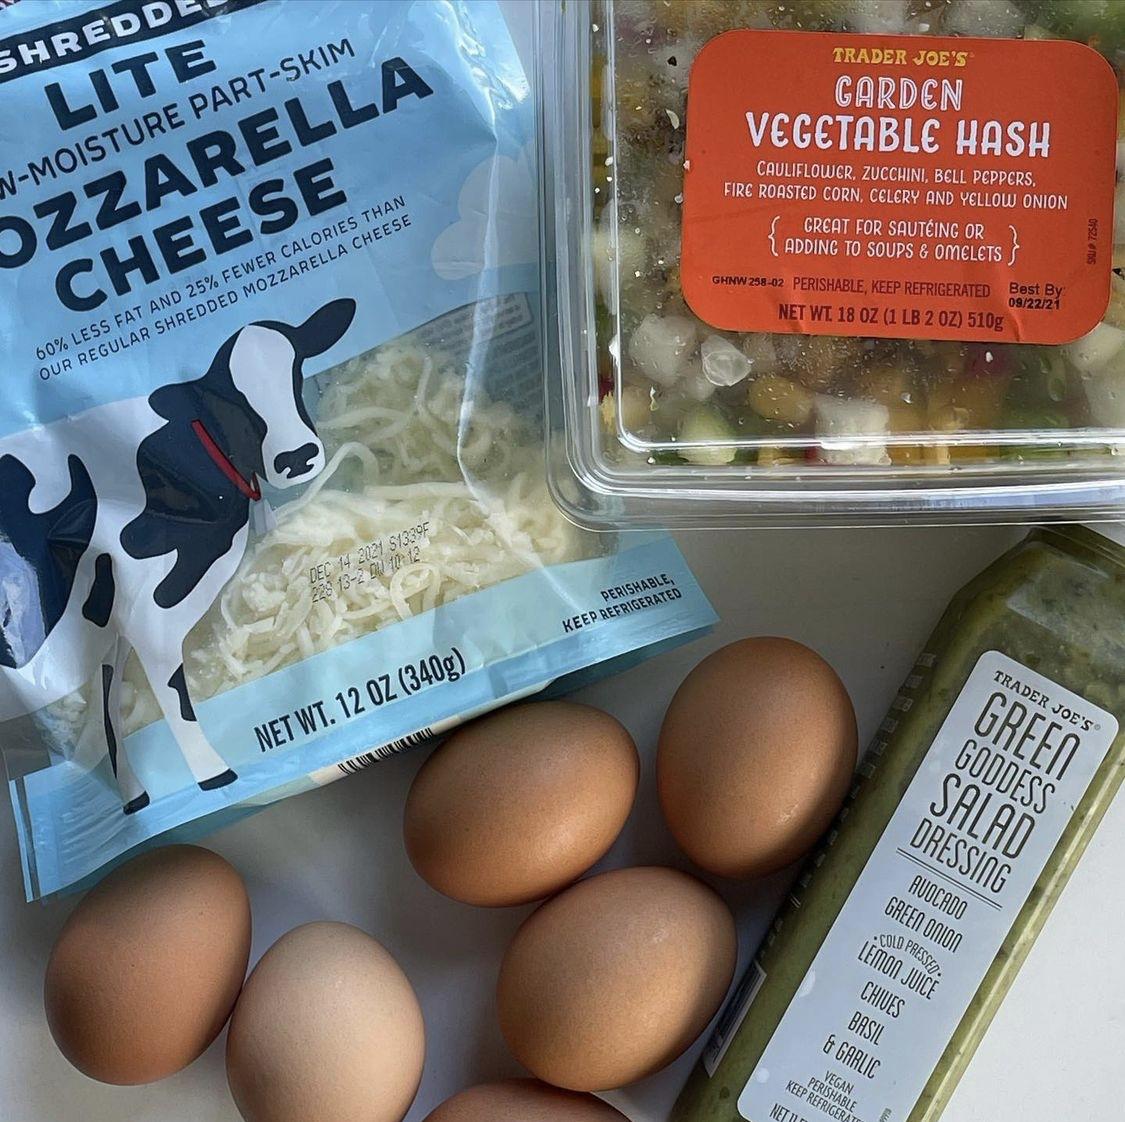 Green goddess veggie frittata -One point per serving on Weight Watchers Blue